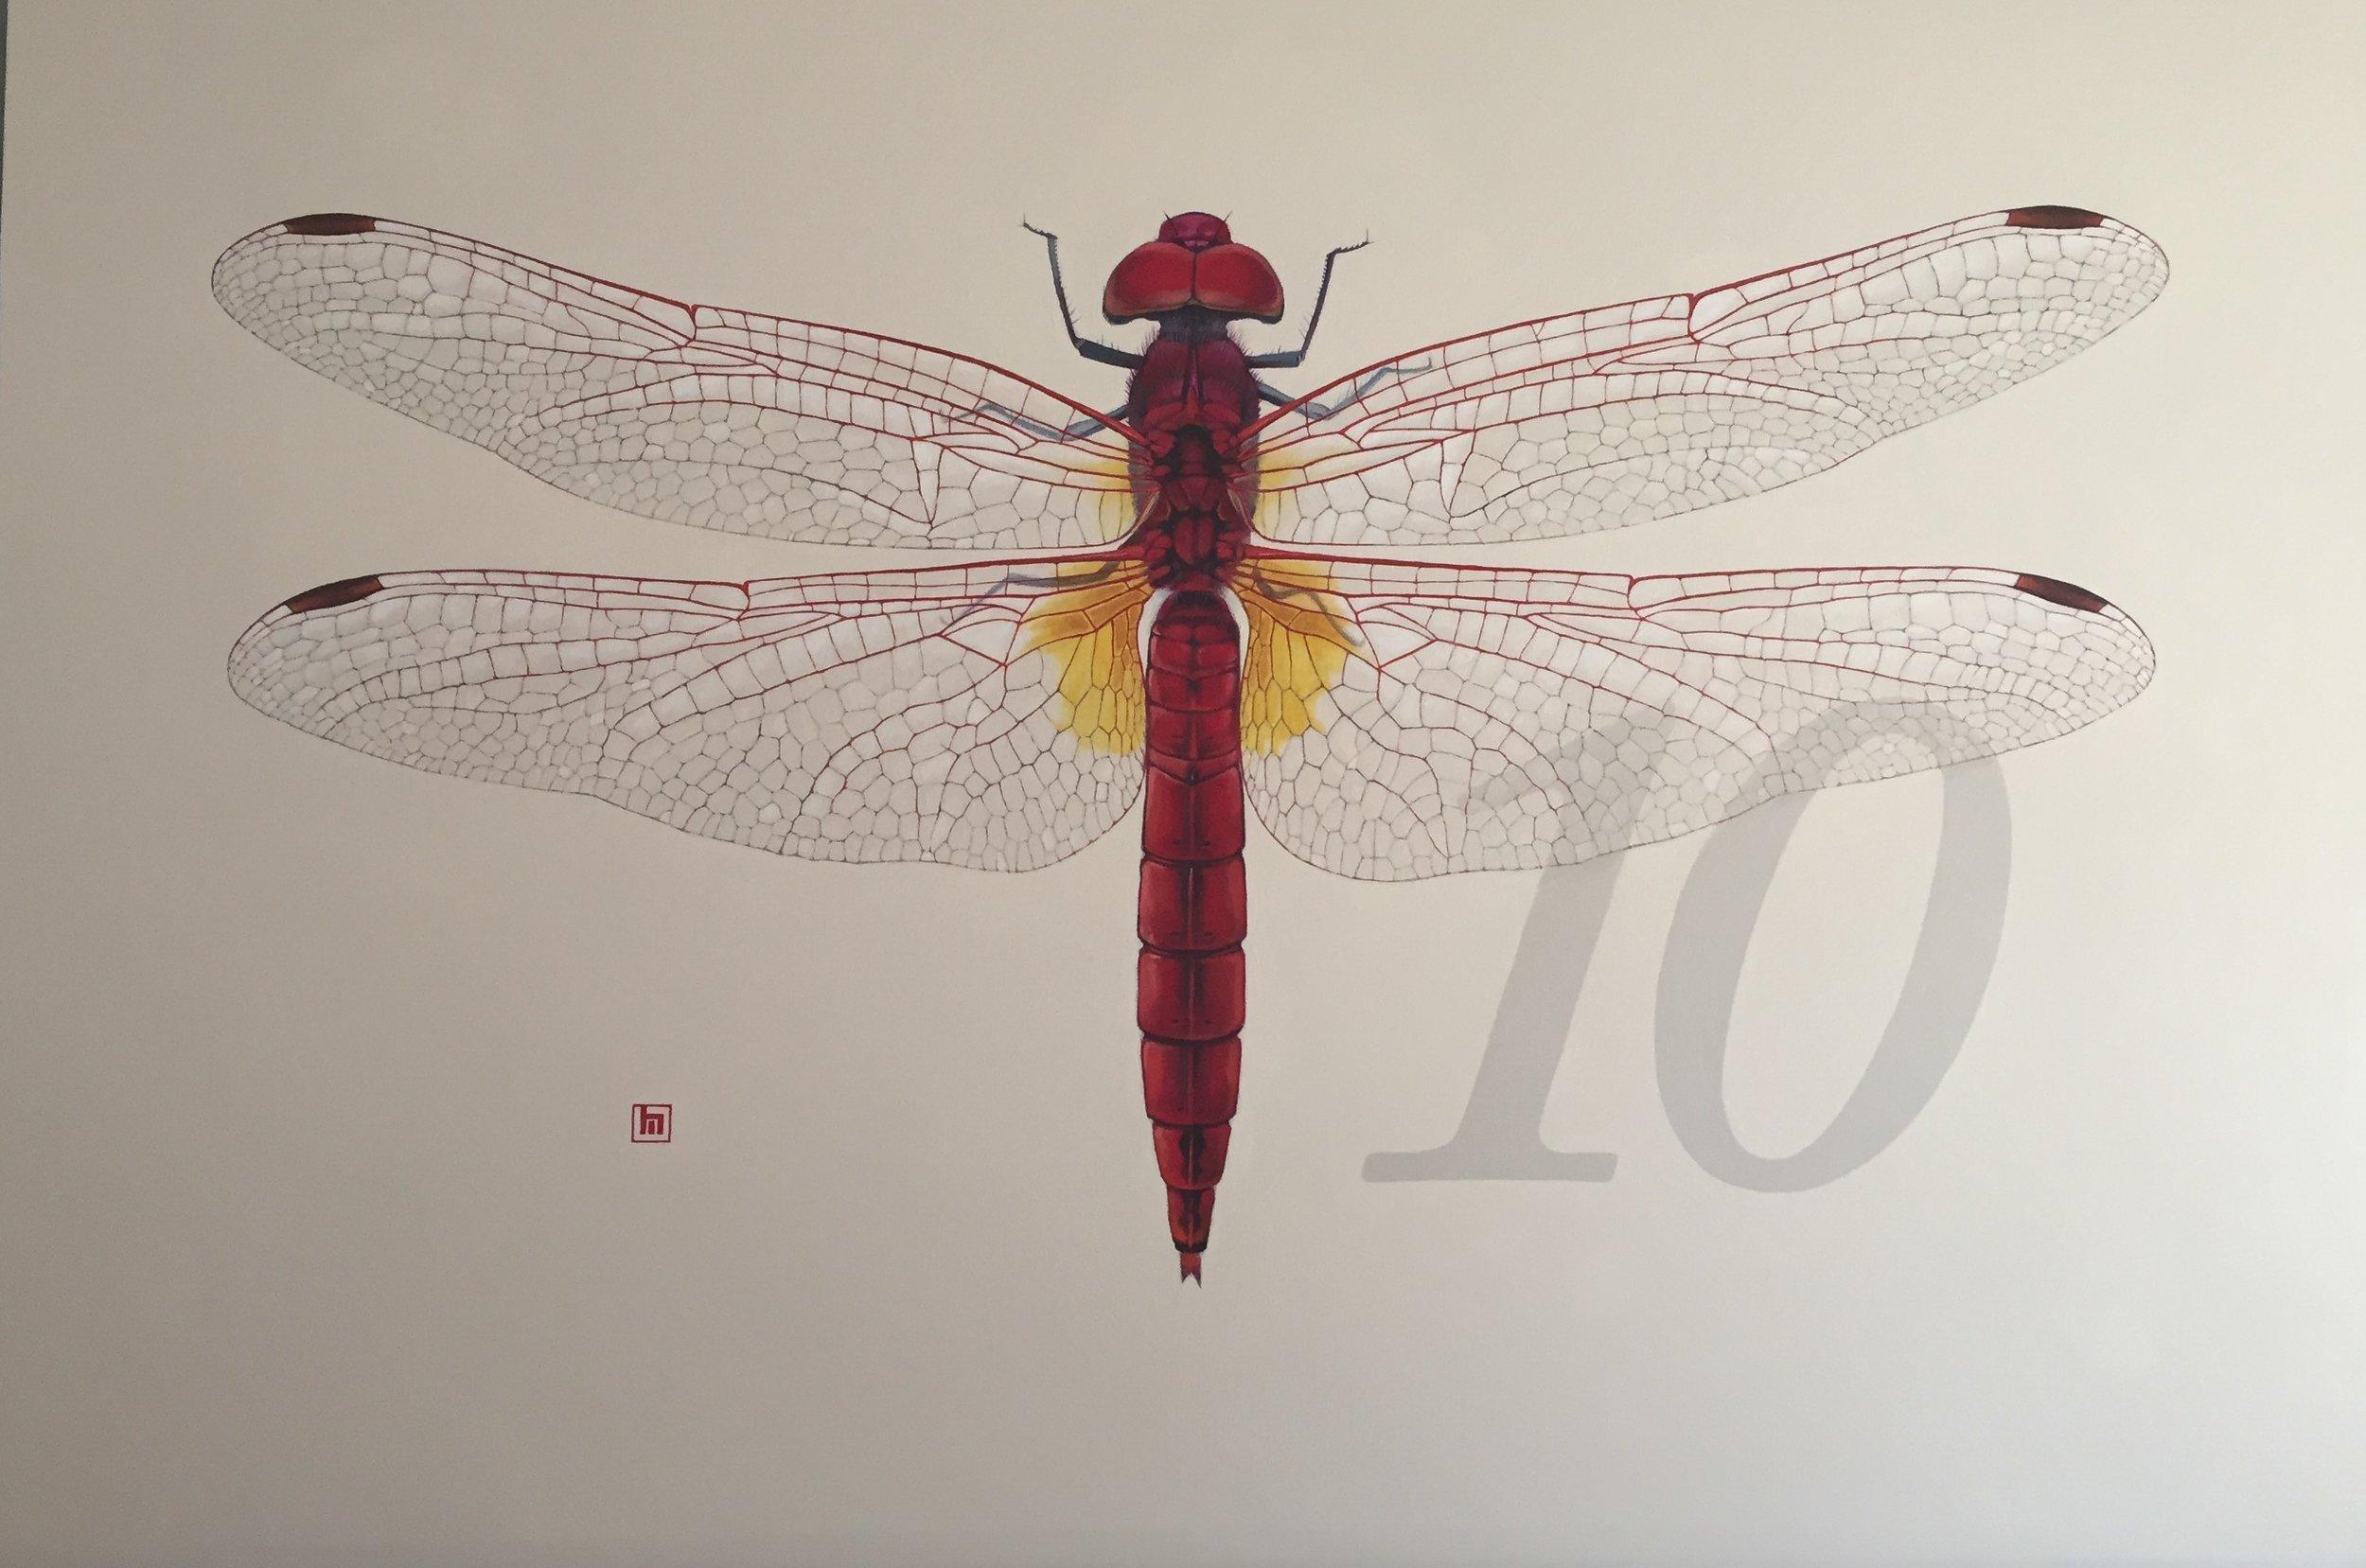 #10 Dragonfly